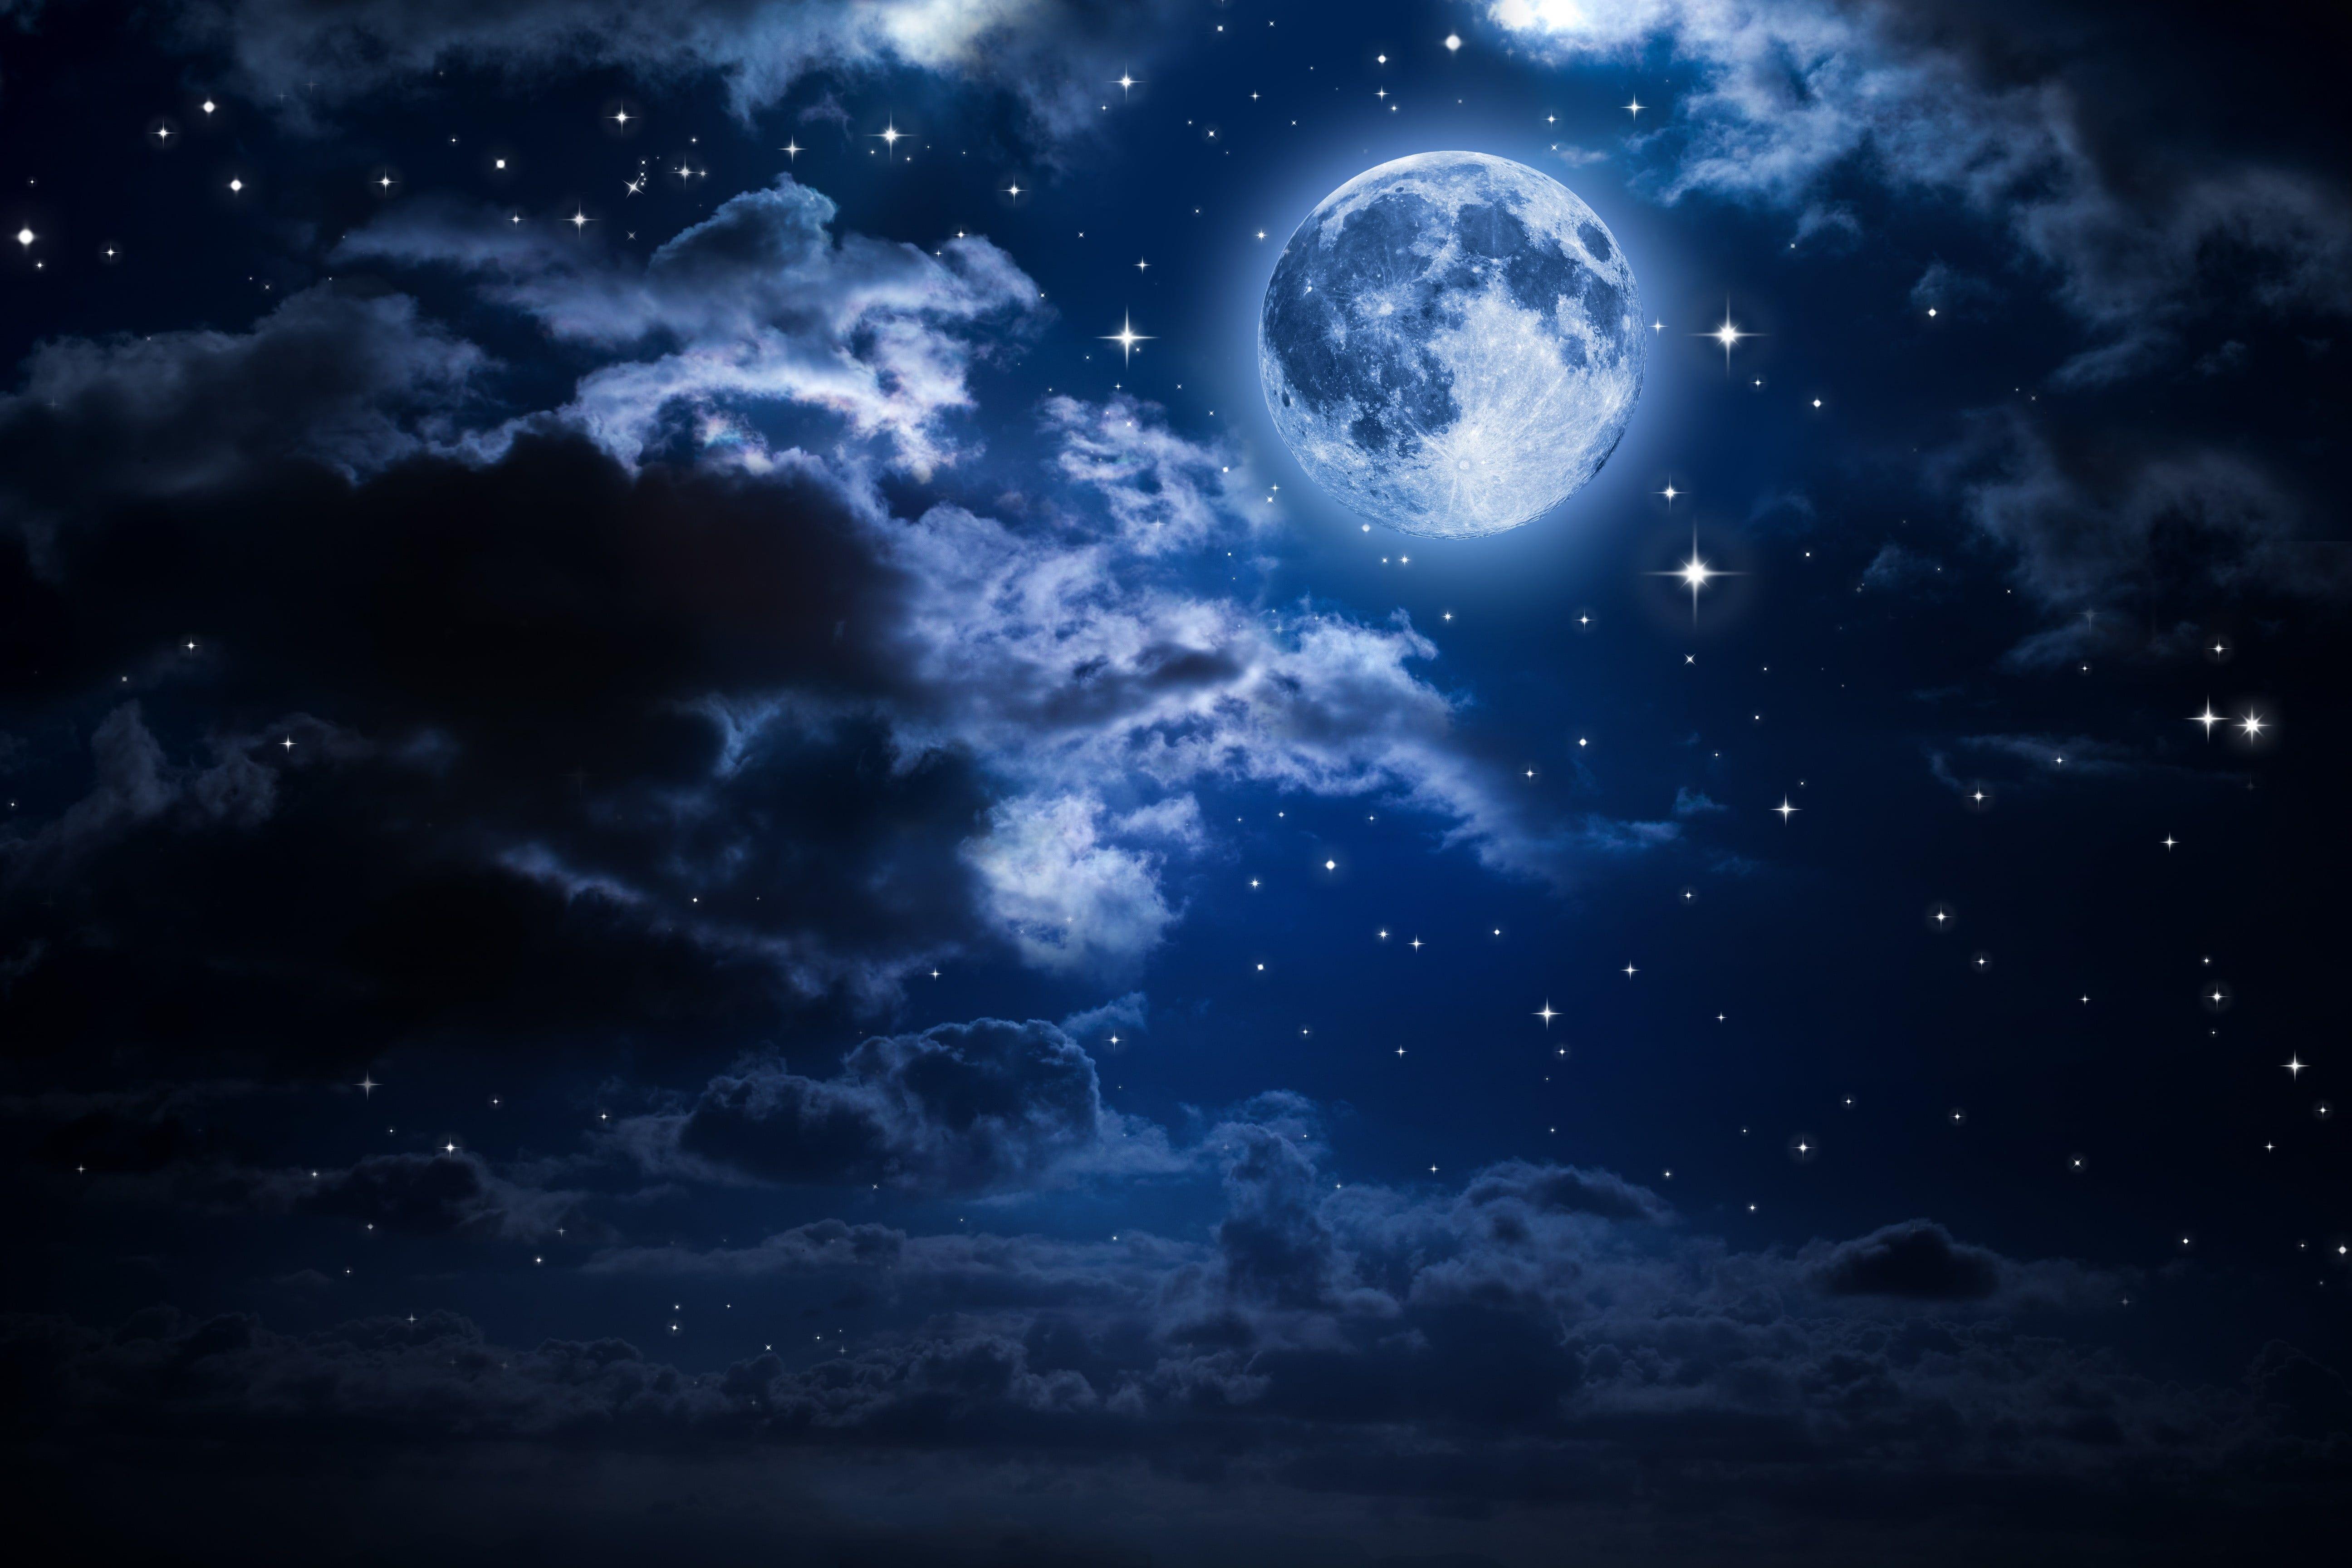 Full Moon Wallpaper Moon Night Clouds Sky 5k Wallpaper